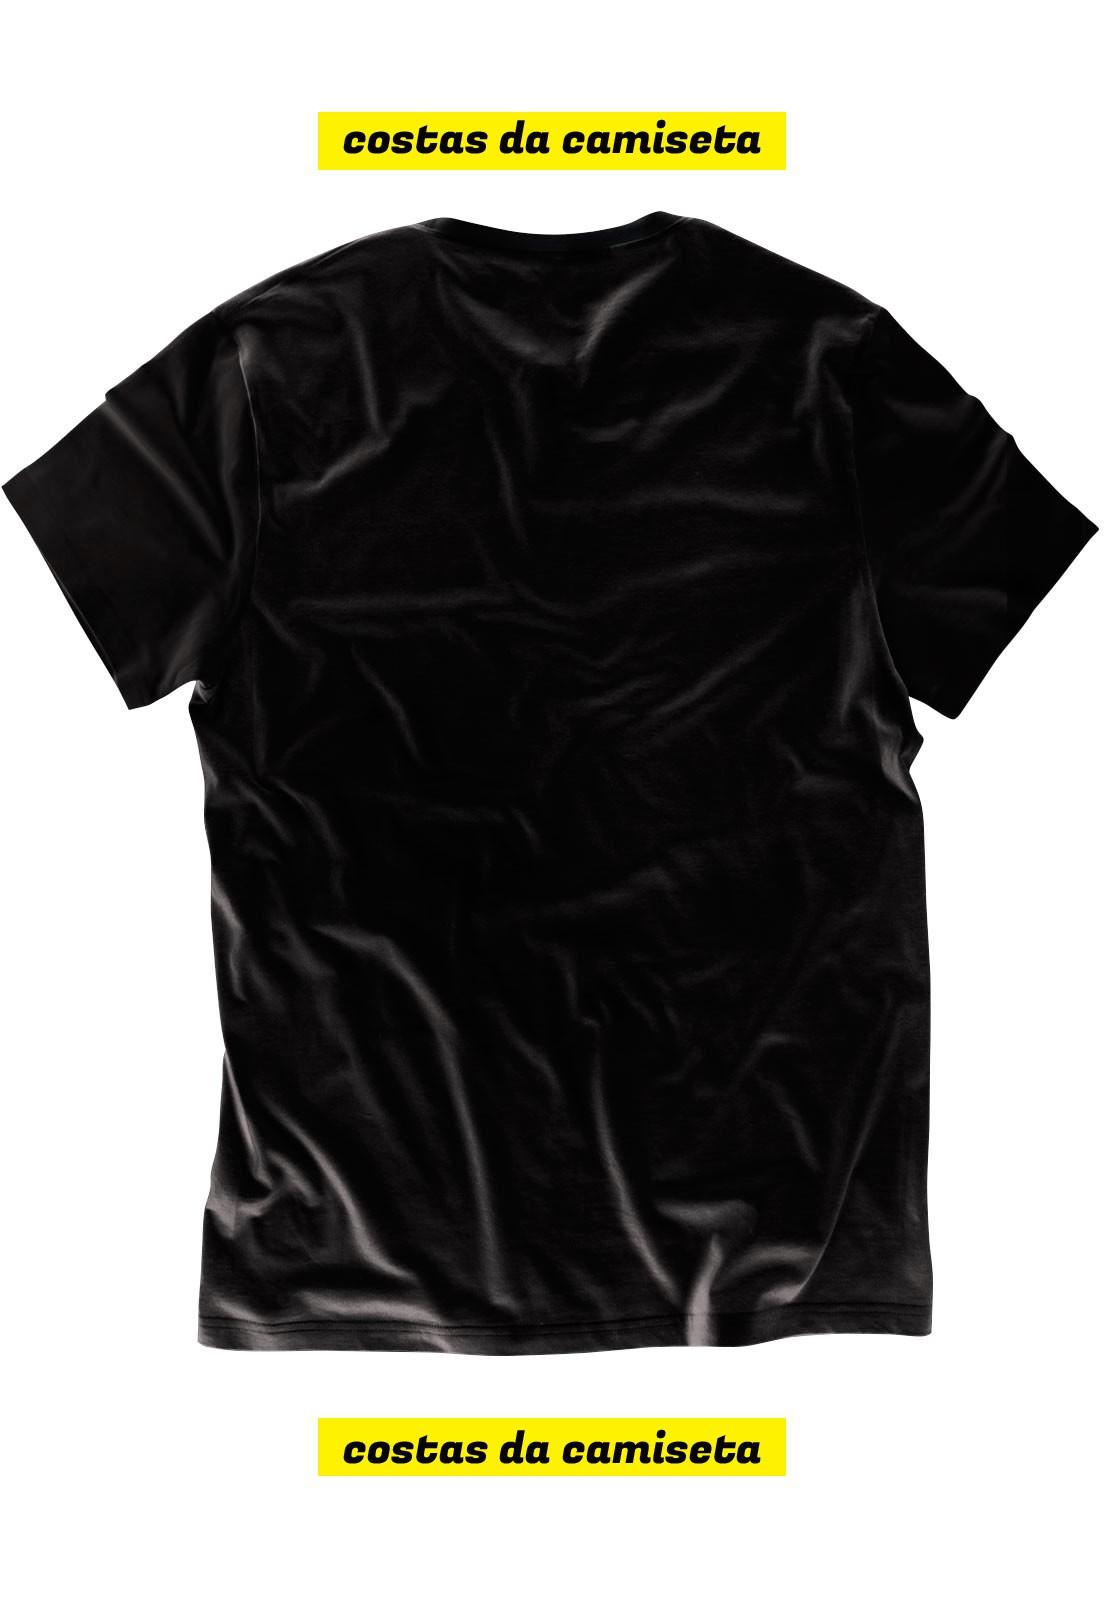 Camiseta Caveira Floral Mexicana Skull Tshirt Swag Camisa